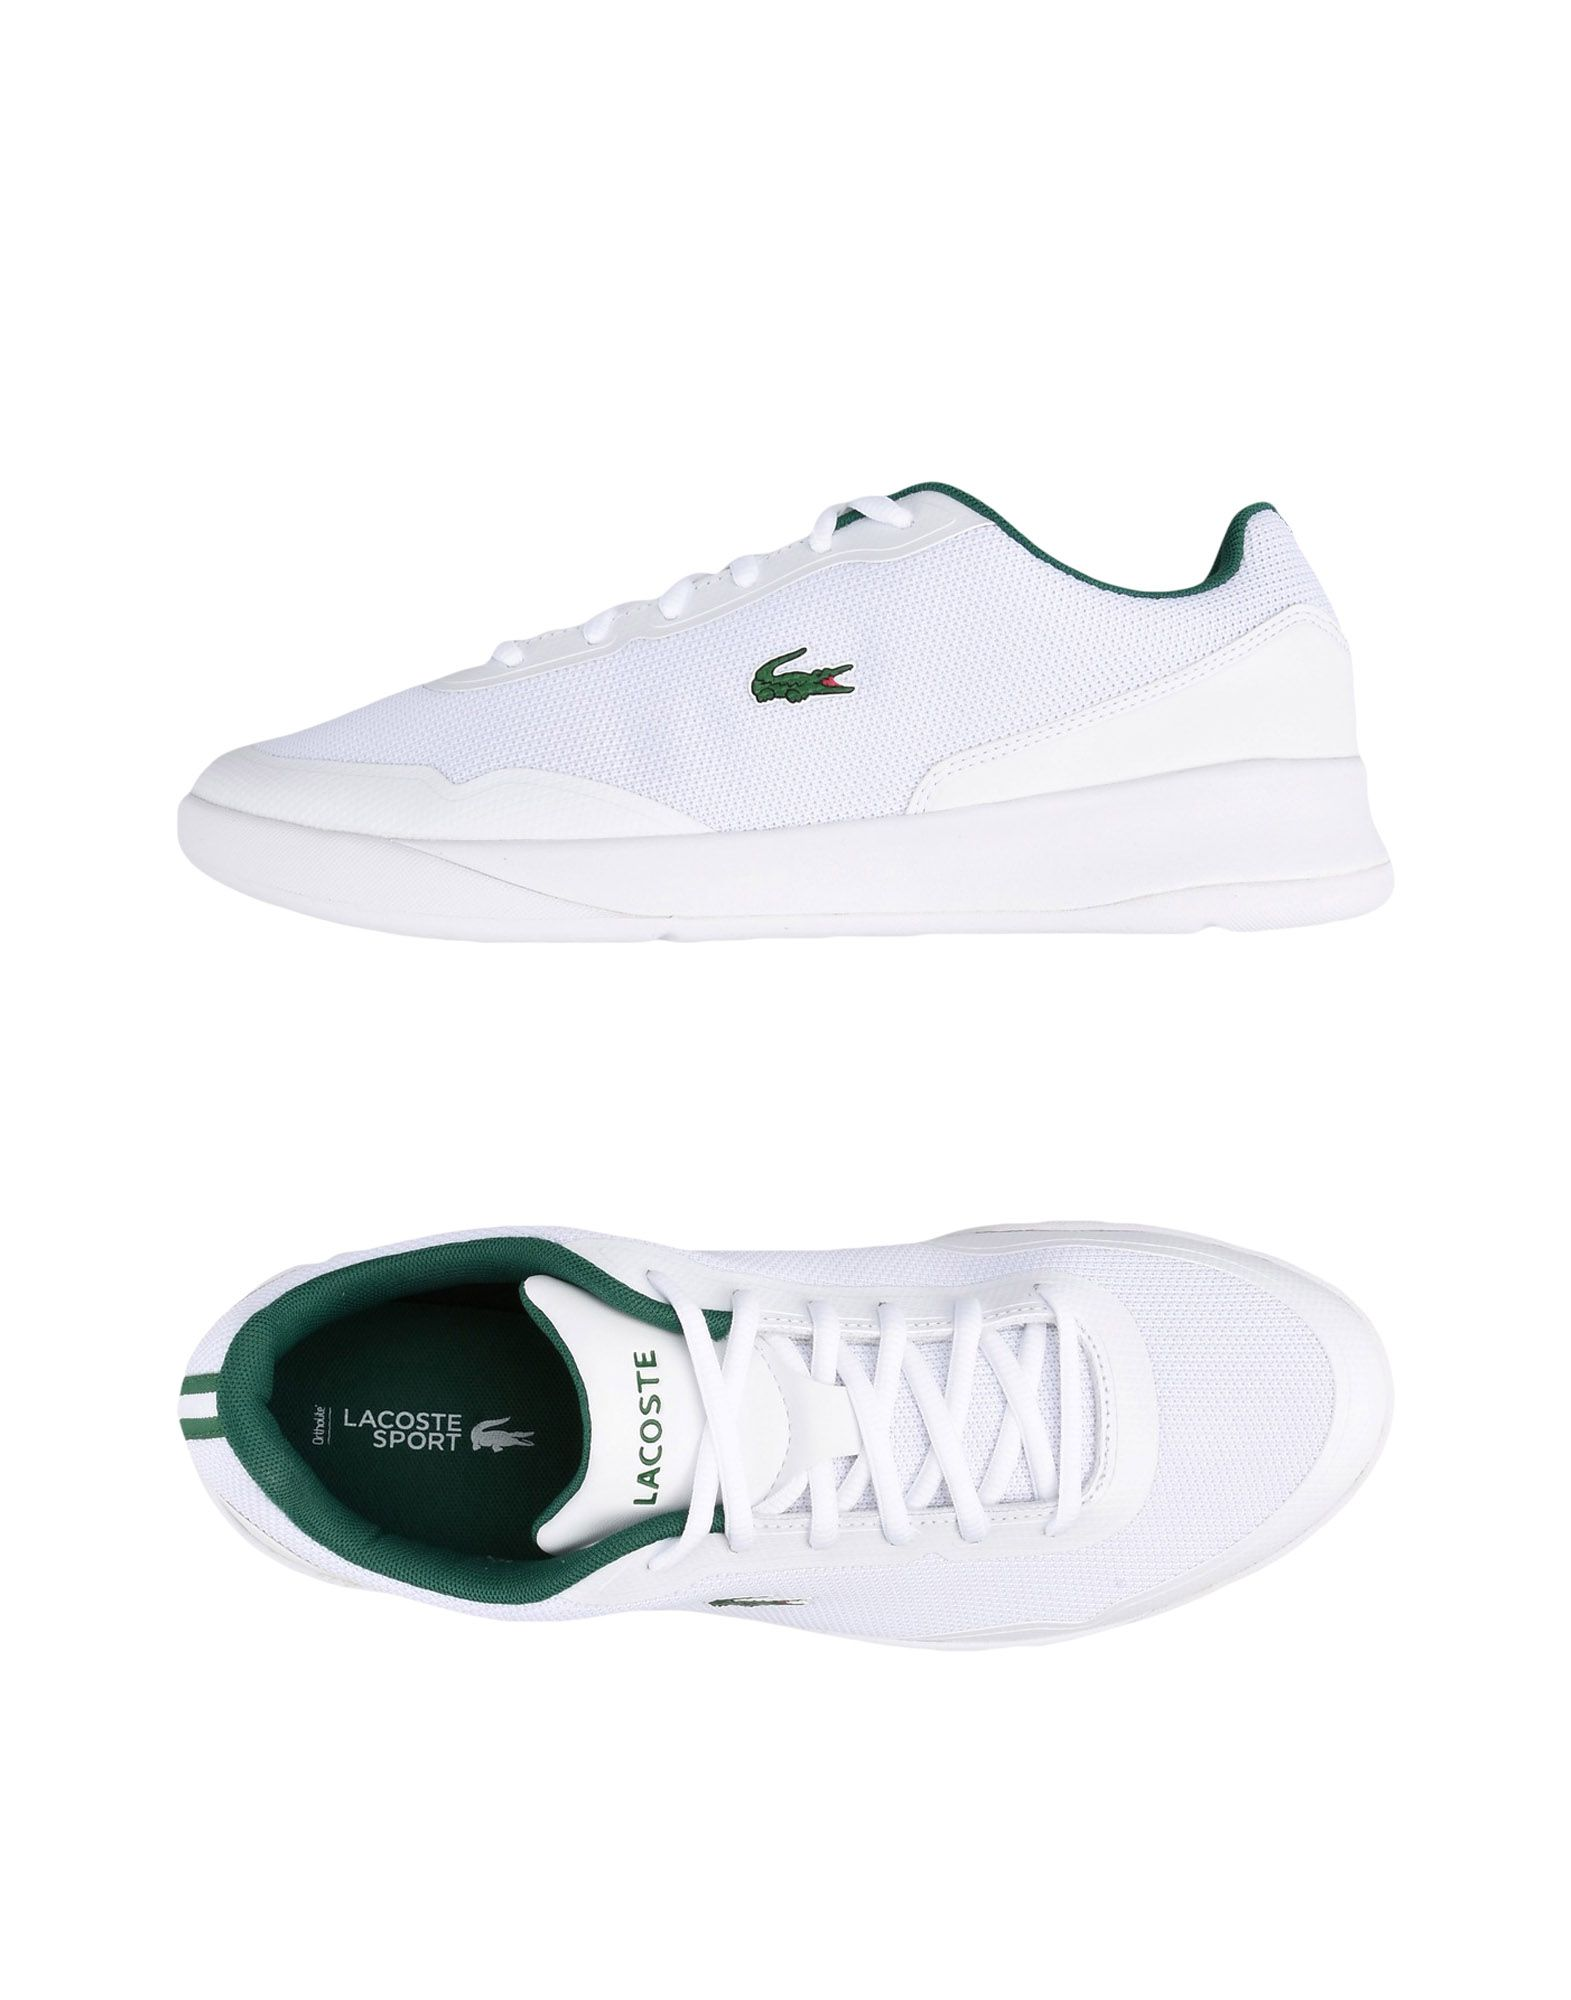 43a9157a5 Lacoste Sport Lt Spirit 117 1 - Sneakers - Men Lacoste Sport Sneakers  online on YOOX United States - 11210942IH